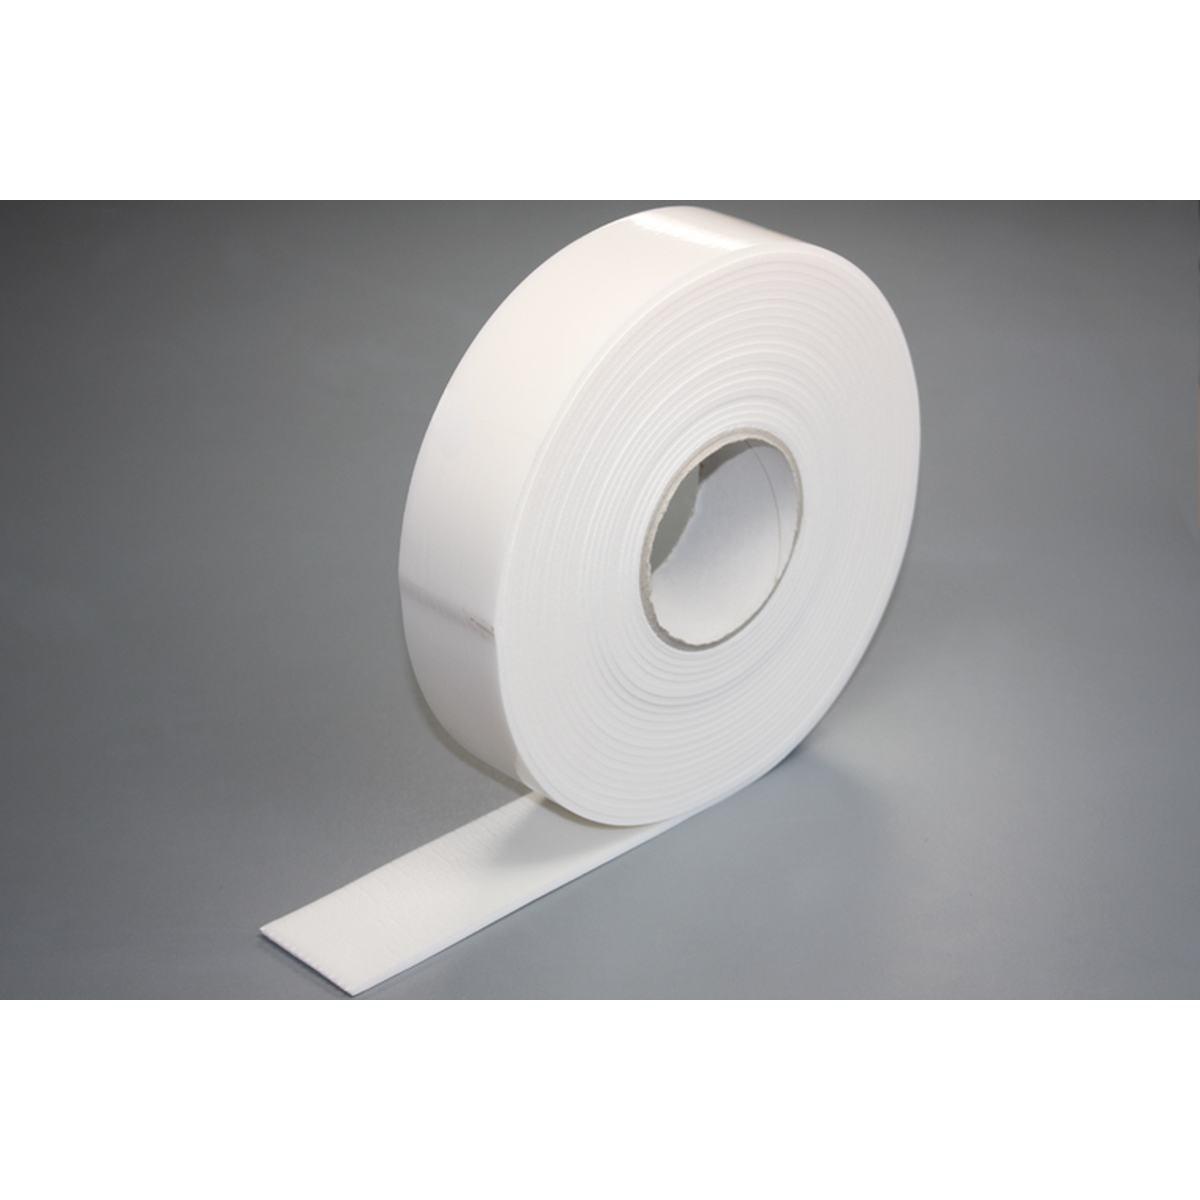 Isoleret anti-kondenstape hvid rulle á 10 meter